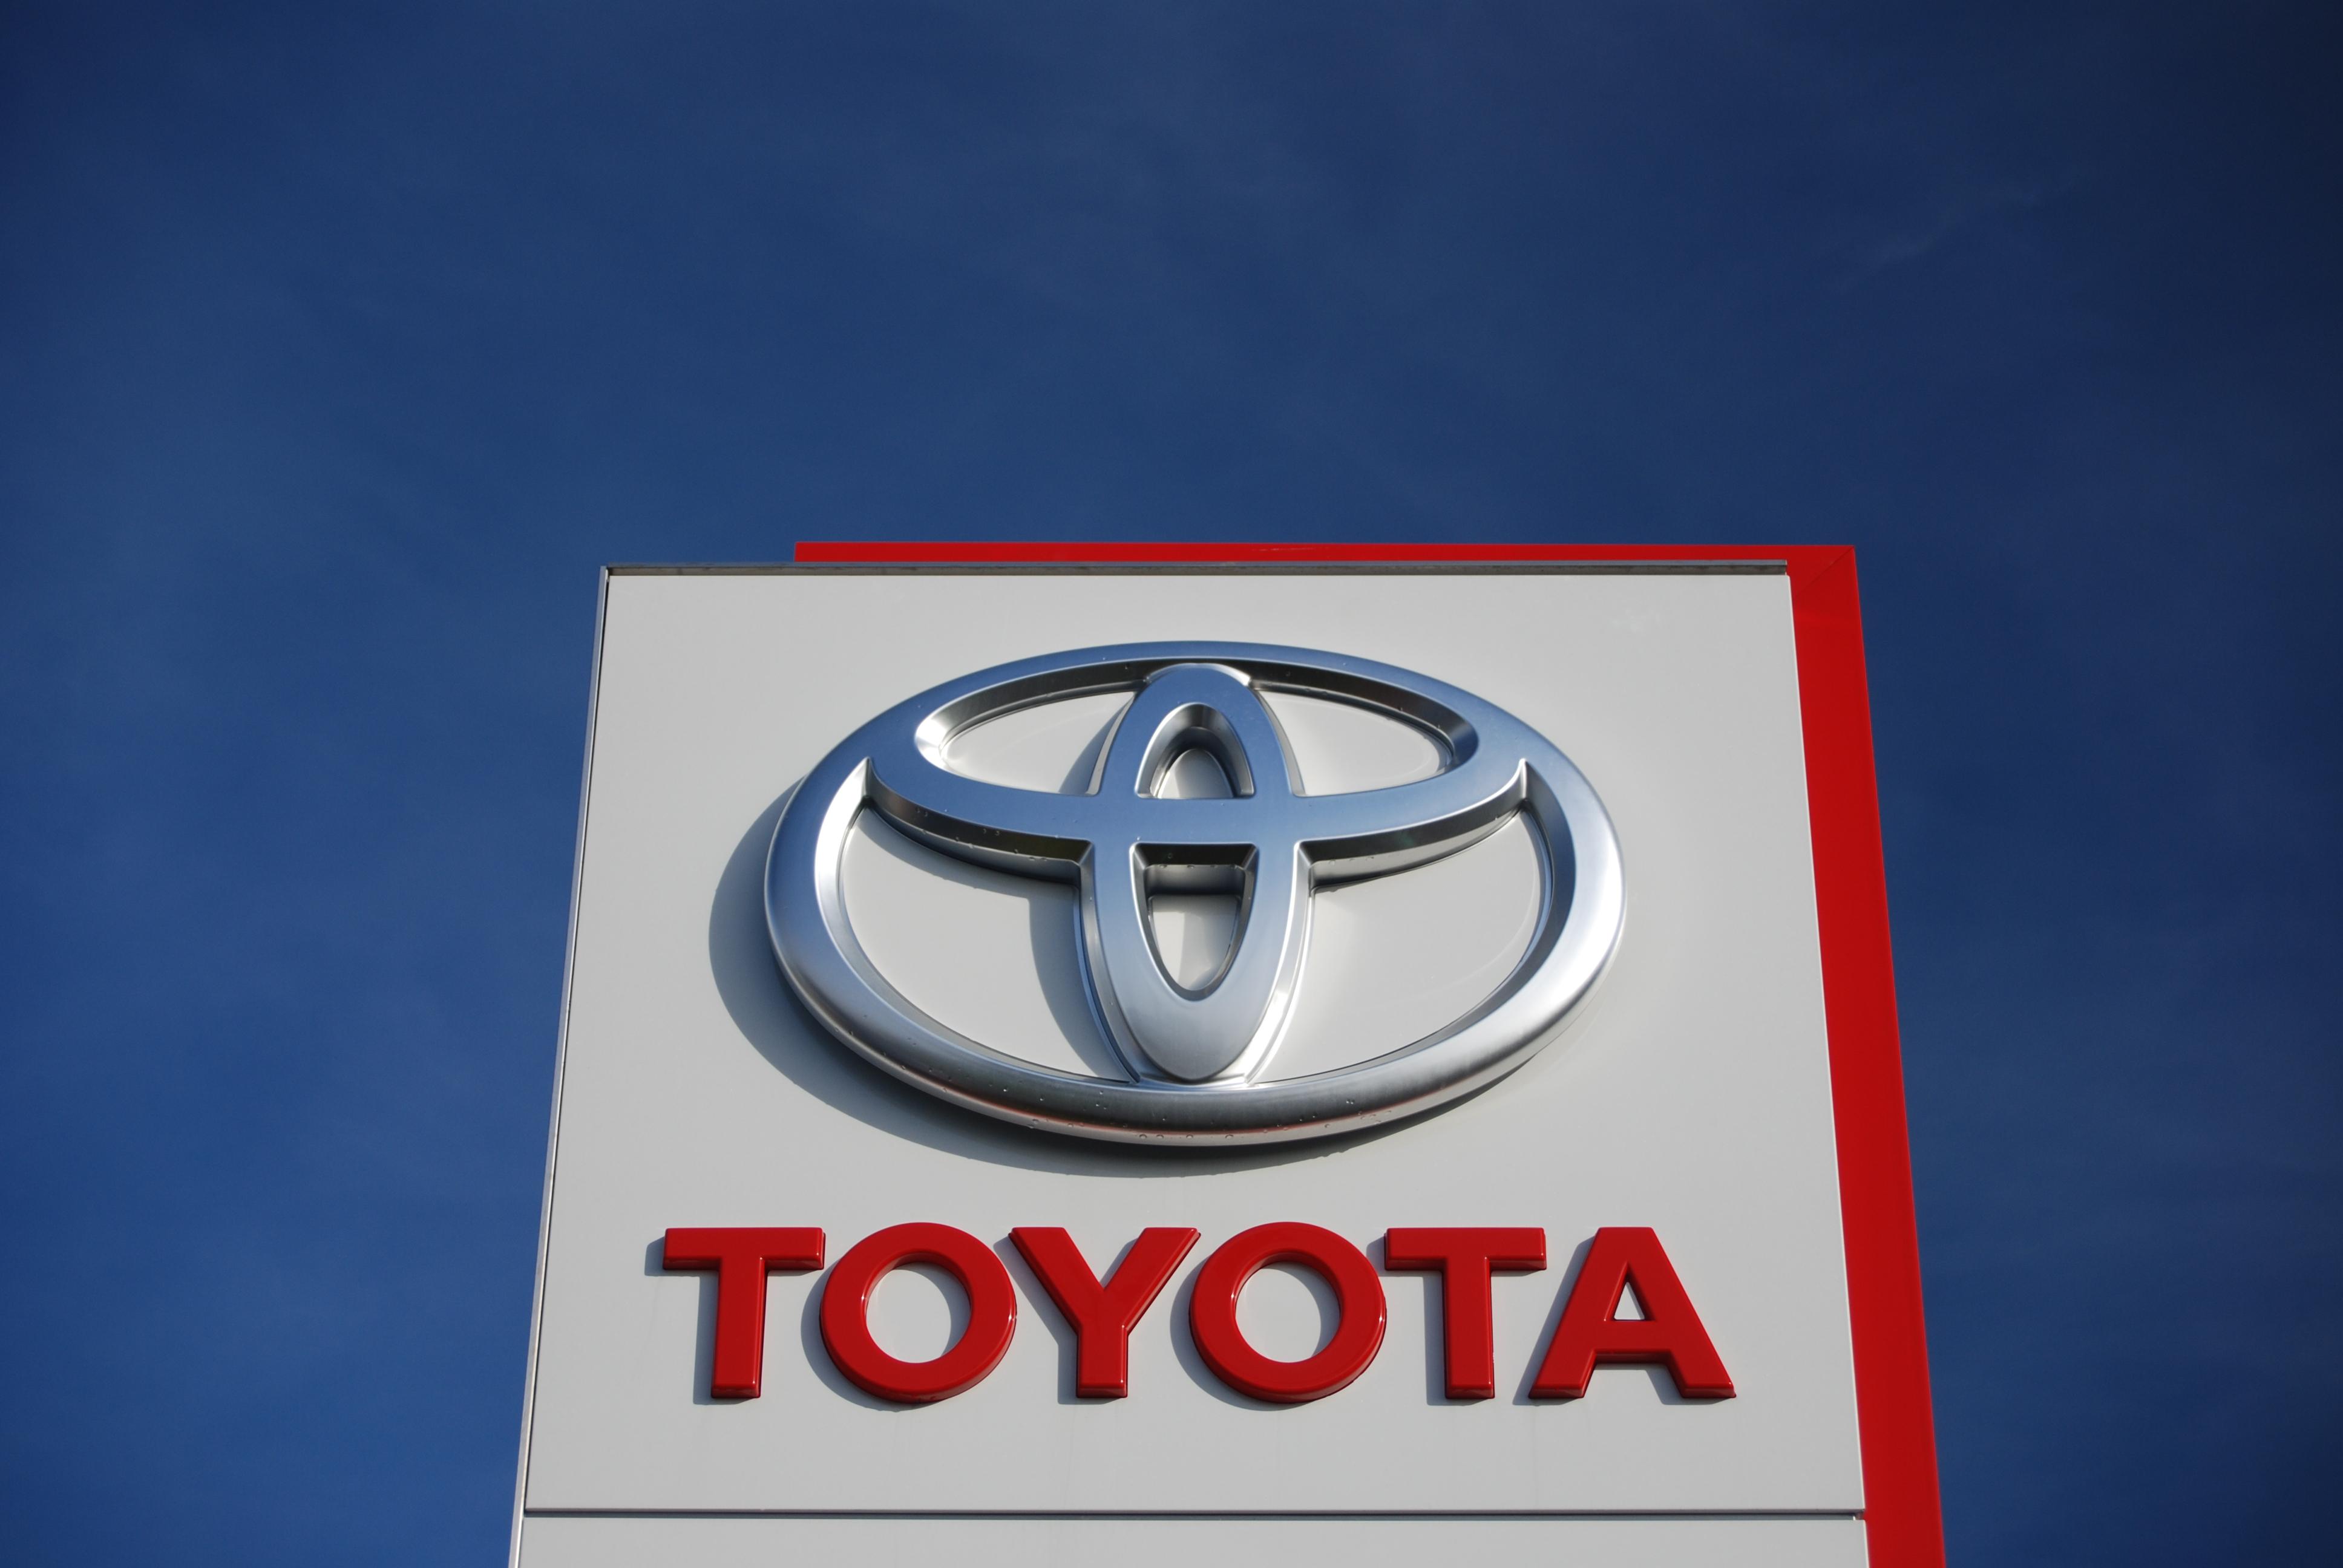 Toyota Fortuner Logo Vector Toyota Fortuner Vector Logo